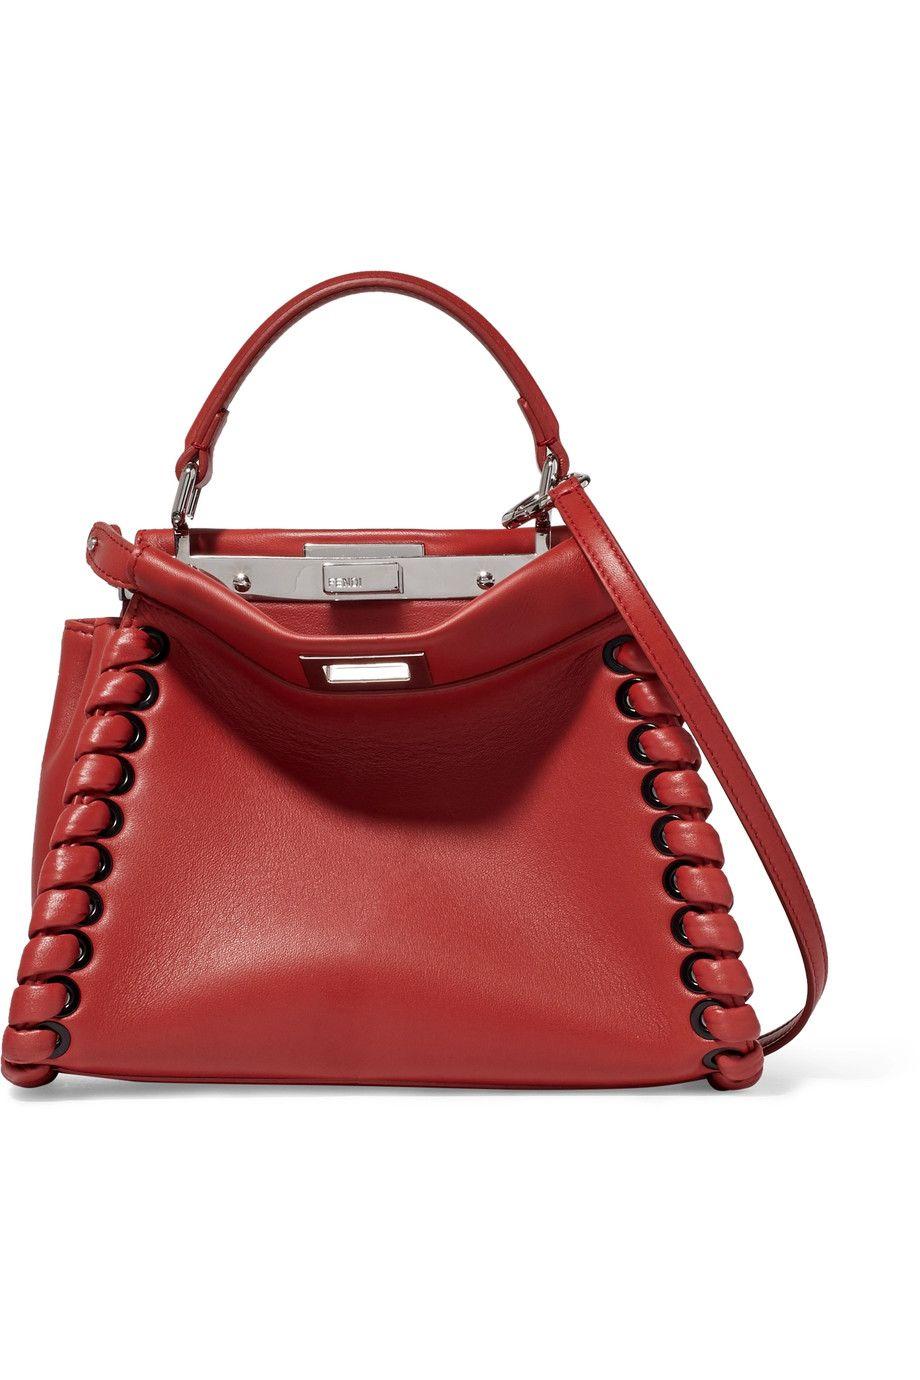 The Fendi mini Peekabo. What a bag.  9e010a740c251